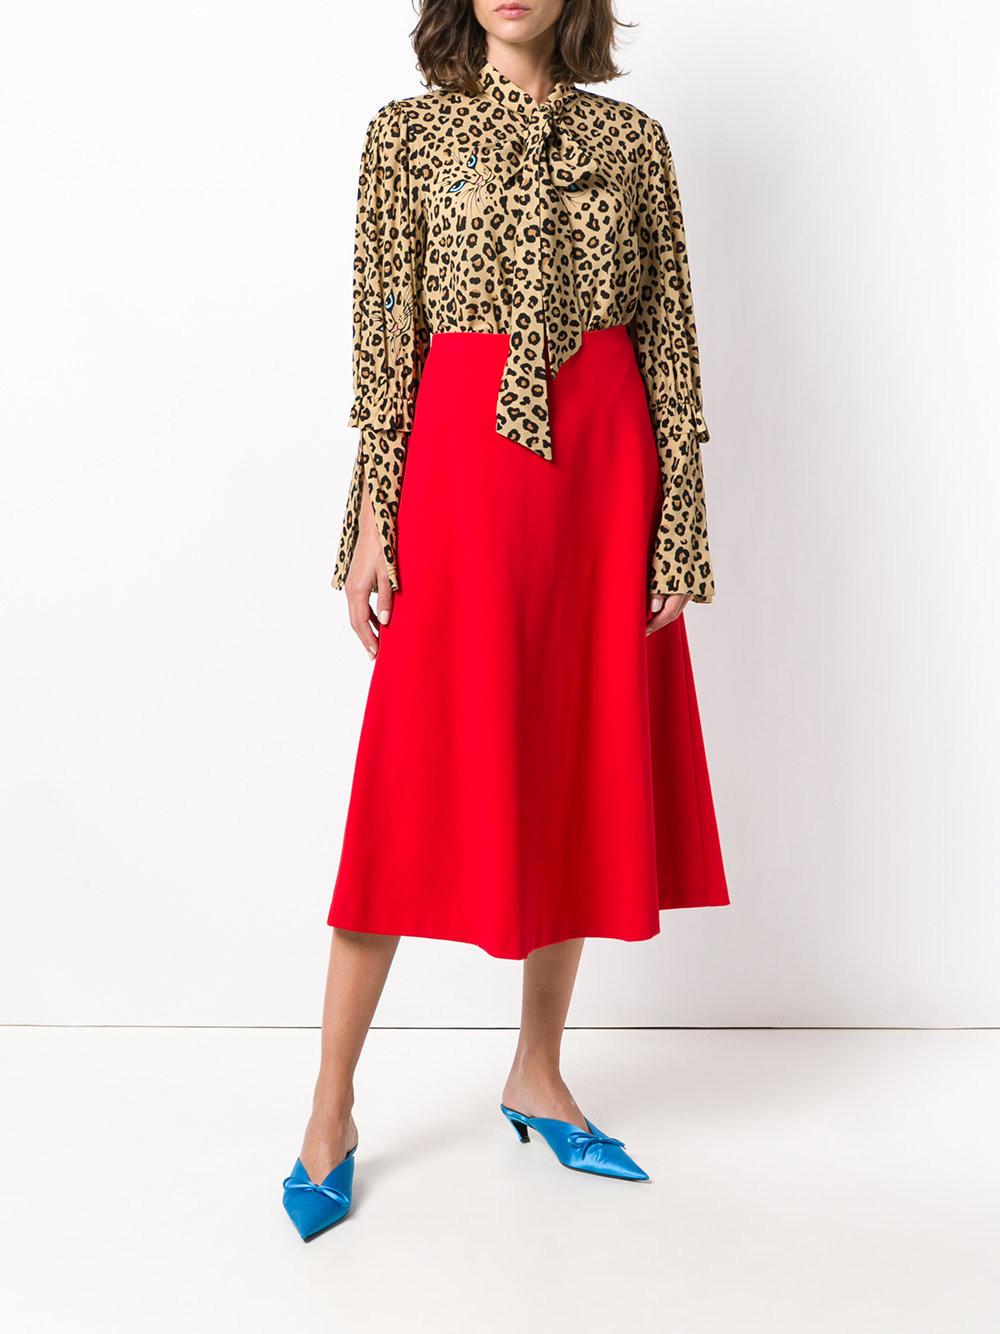 Vivetta leopard pussy bow shirt $815